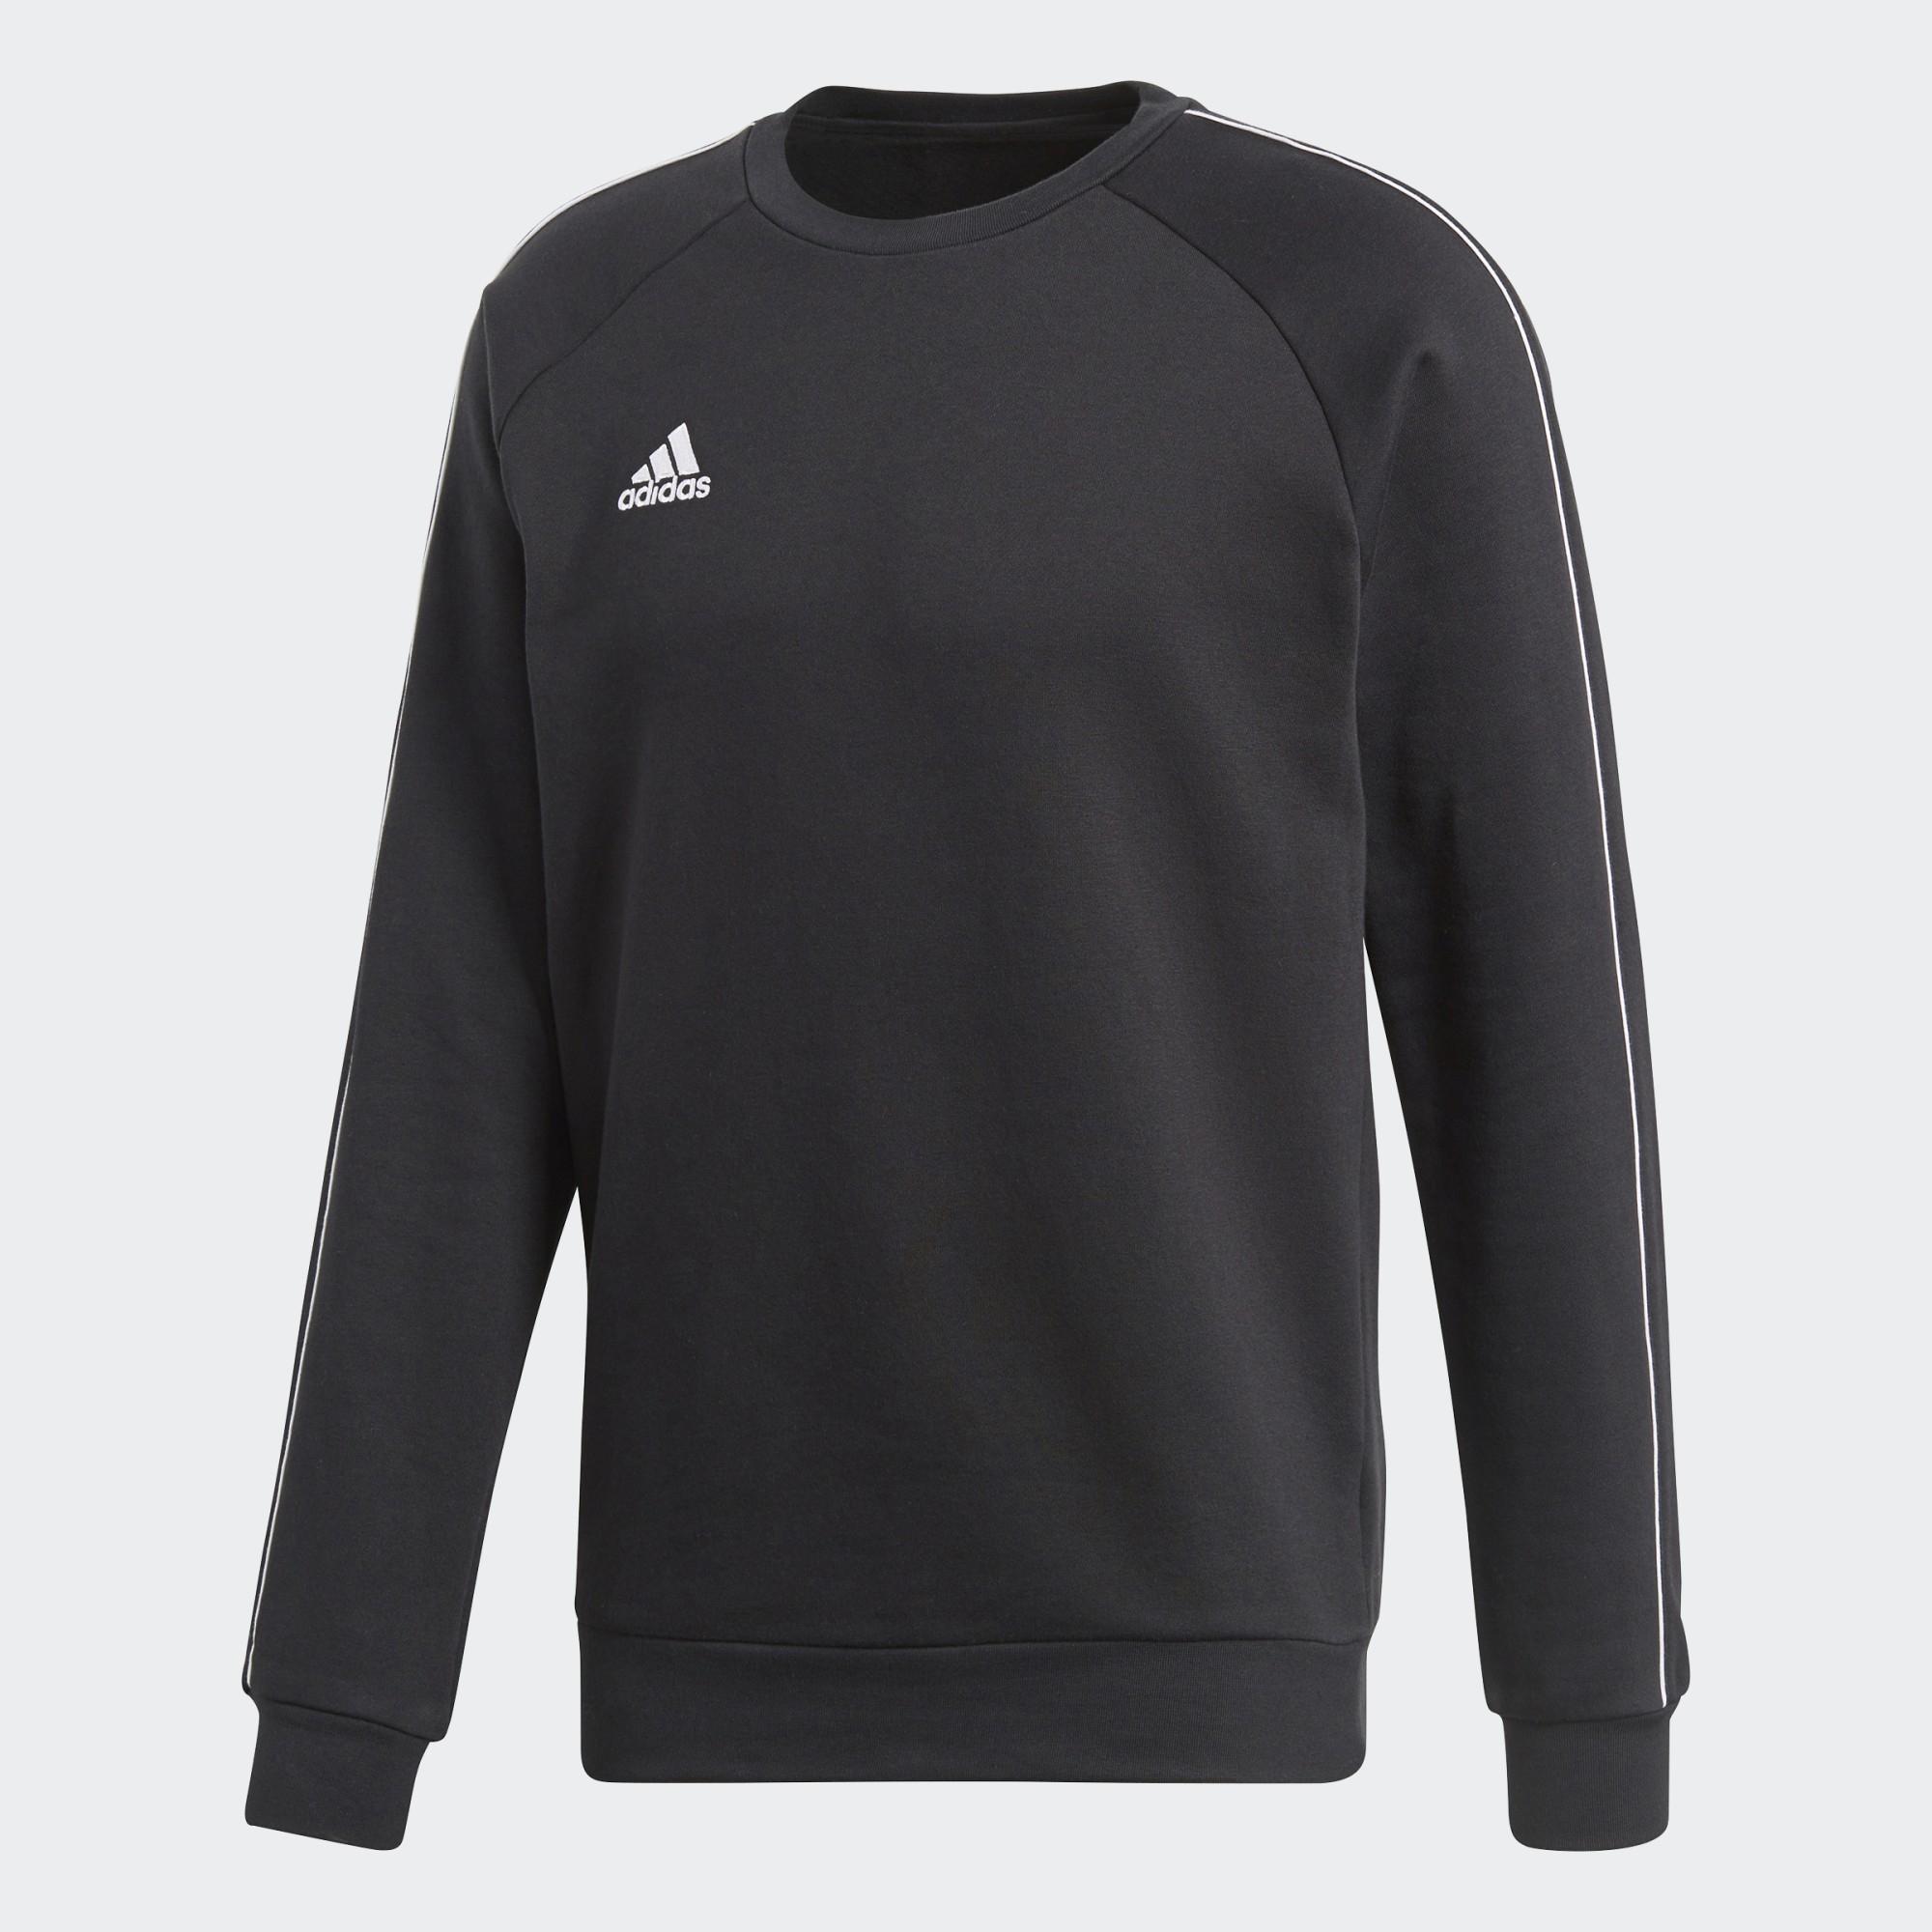 Adidas FELPA CORE 18 TOP